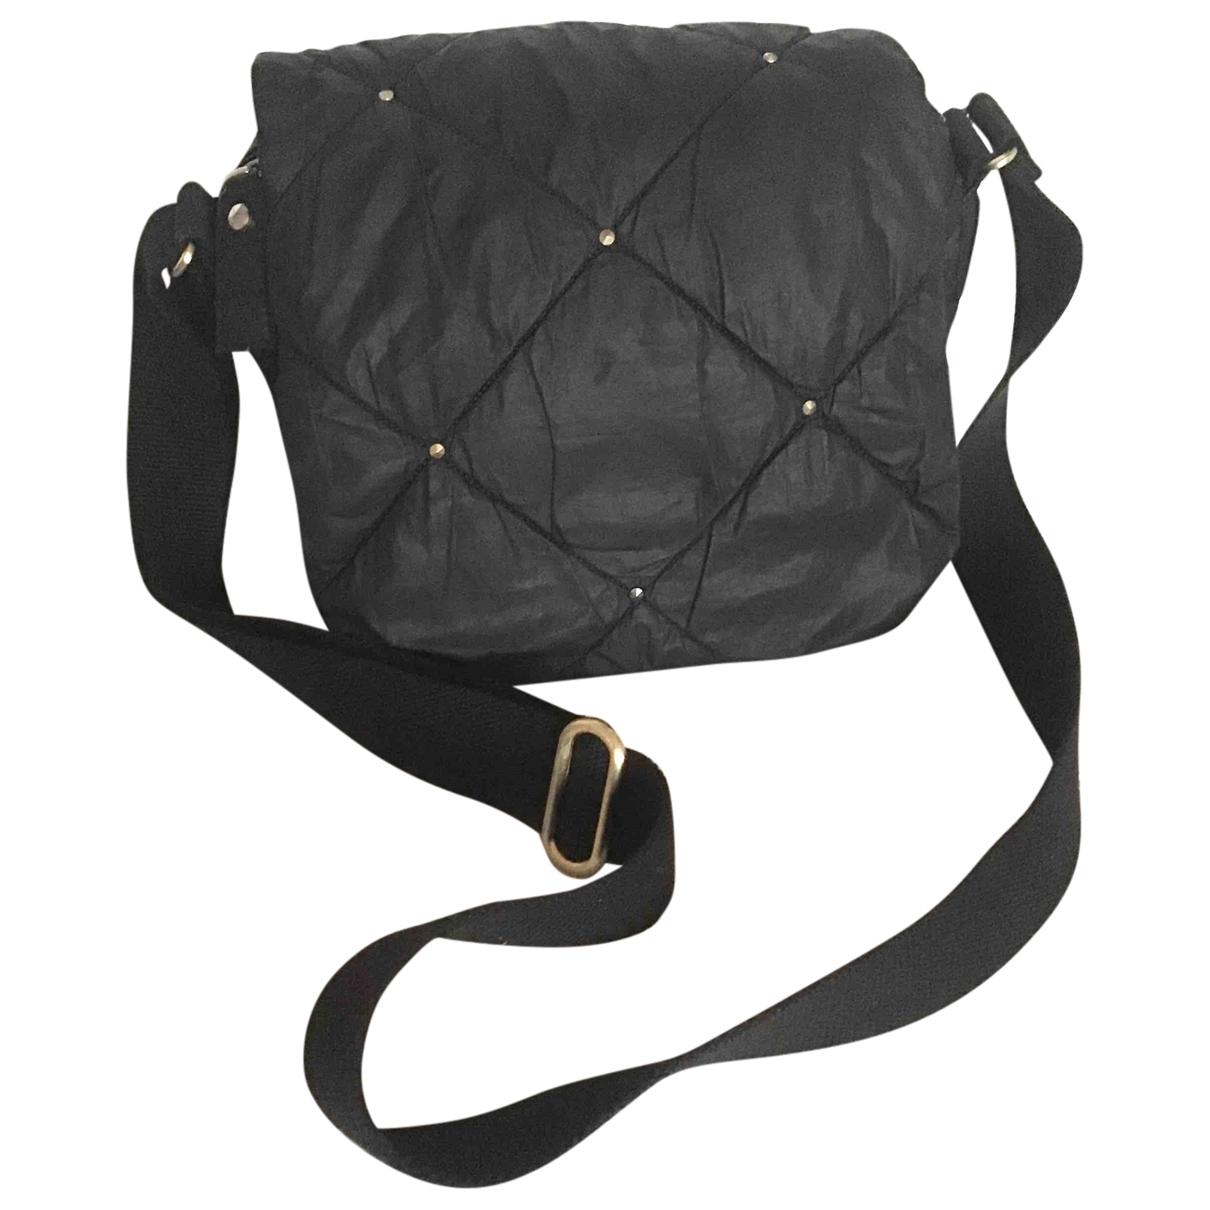 Sonia Rykiel \N Handtasche in  Schwarz Synthetik